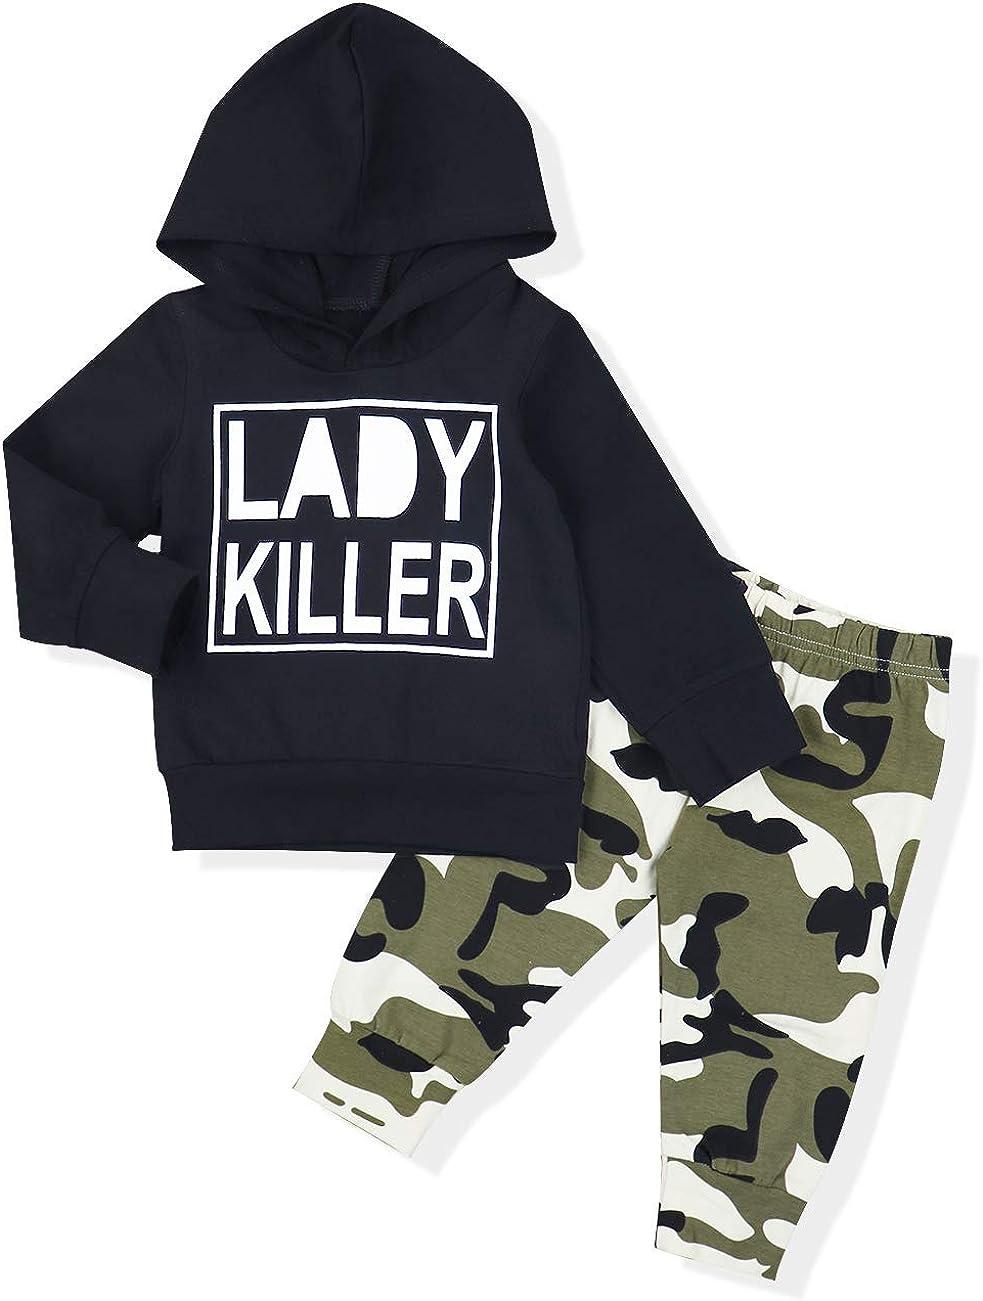 Baby Boy Kleidung Langarm gedruckt Lady Killer Top Hoodie und Camouflage Hosen Infant Outfits Set